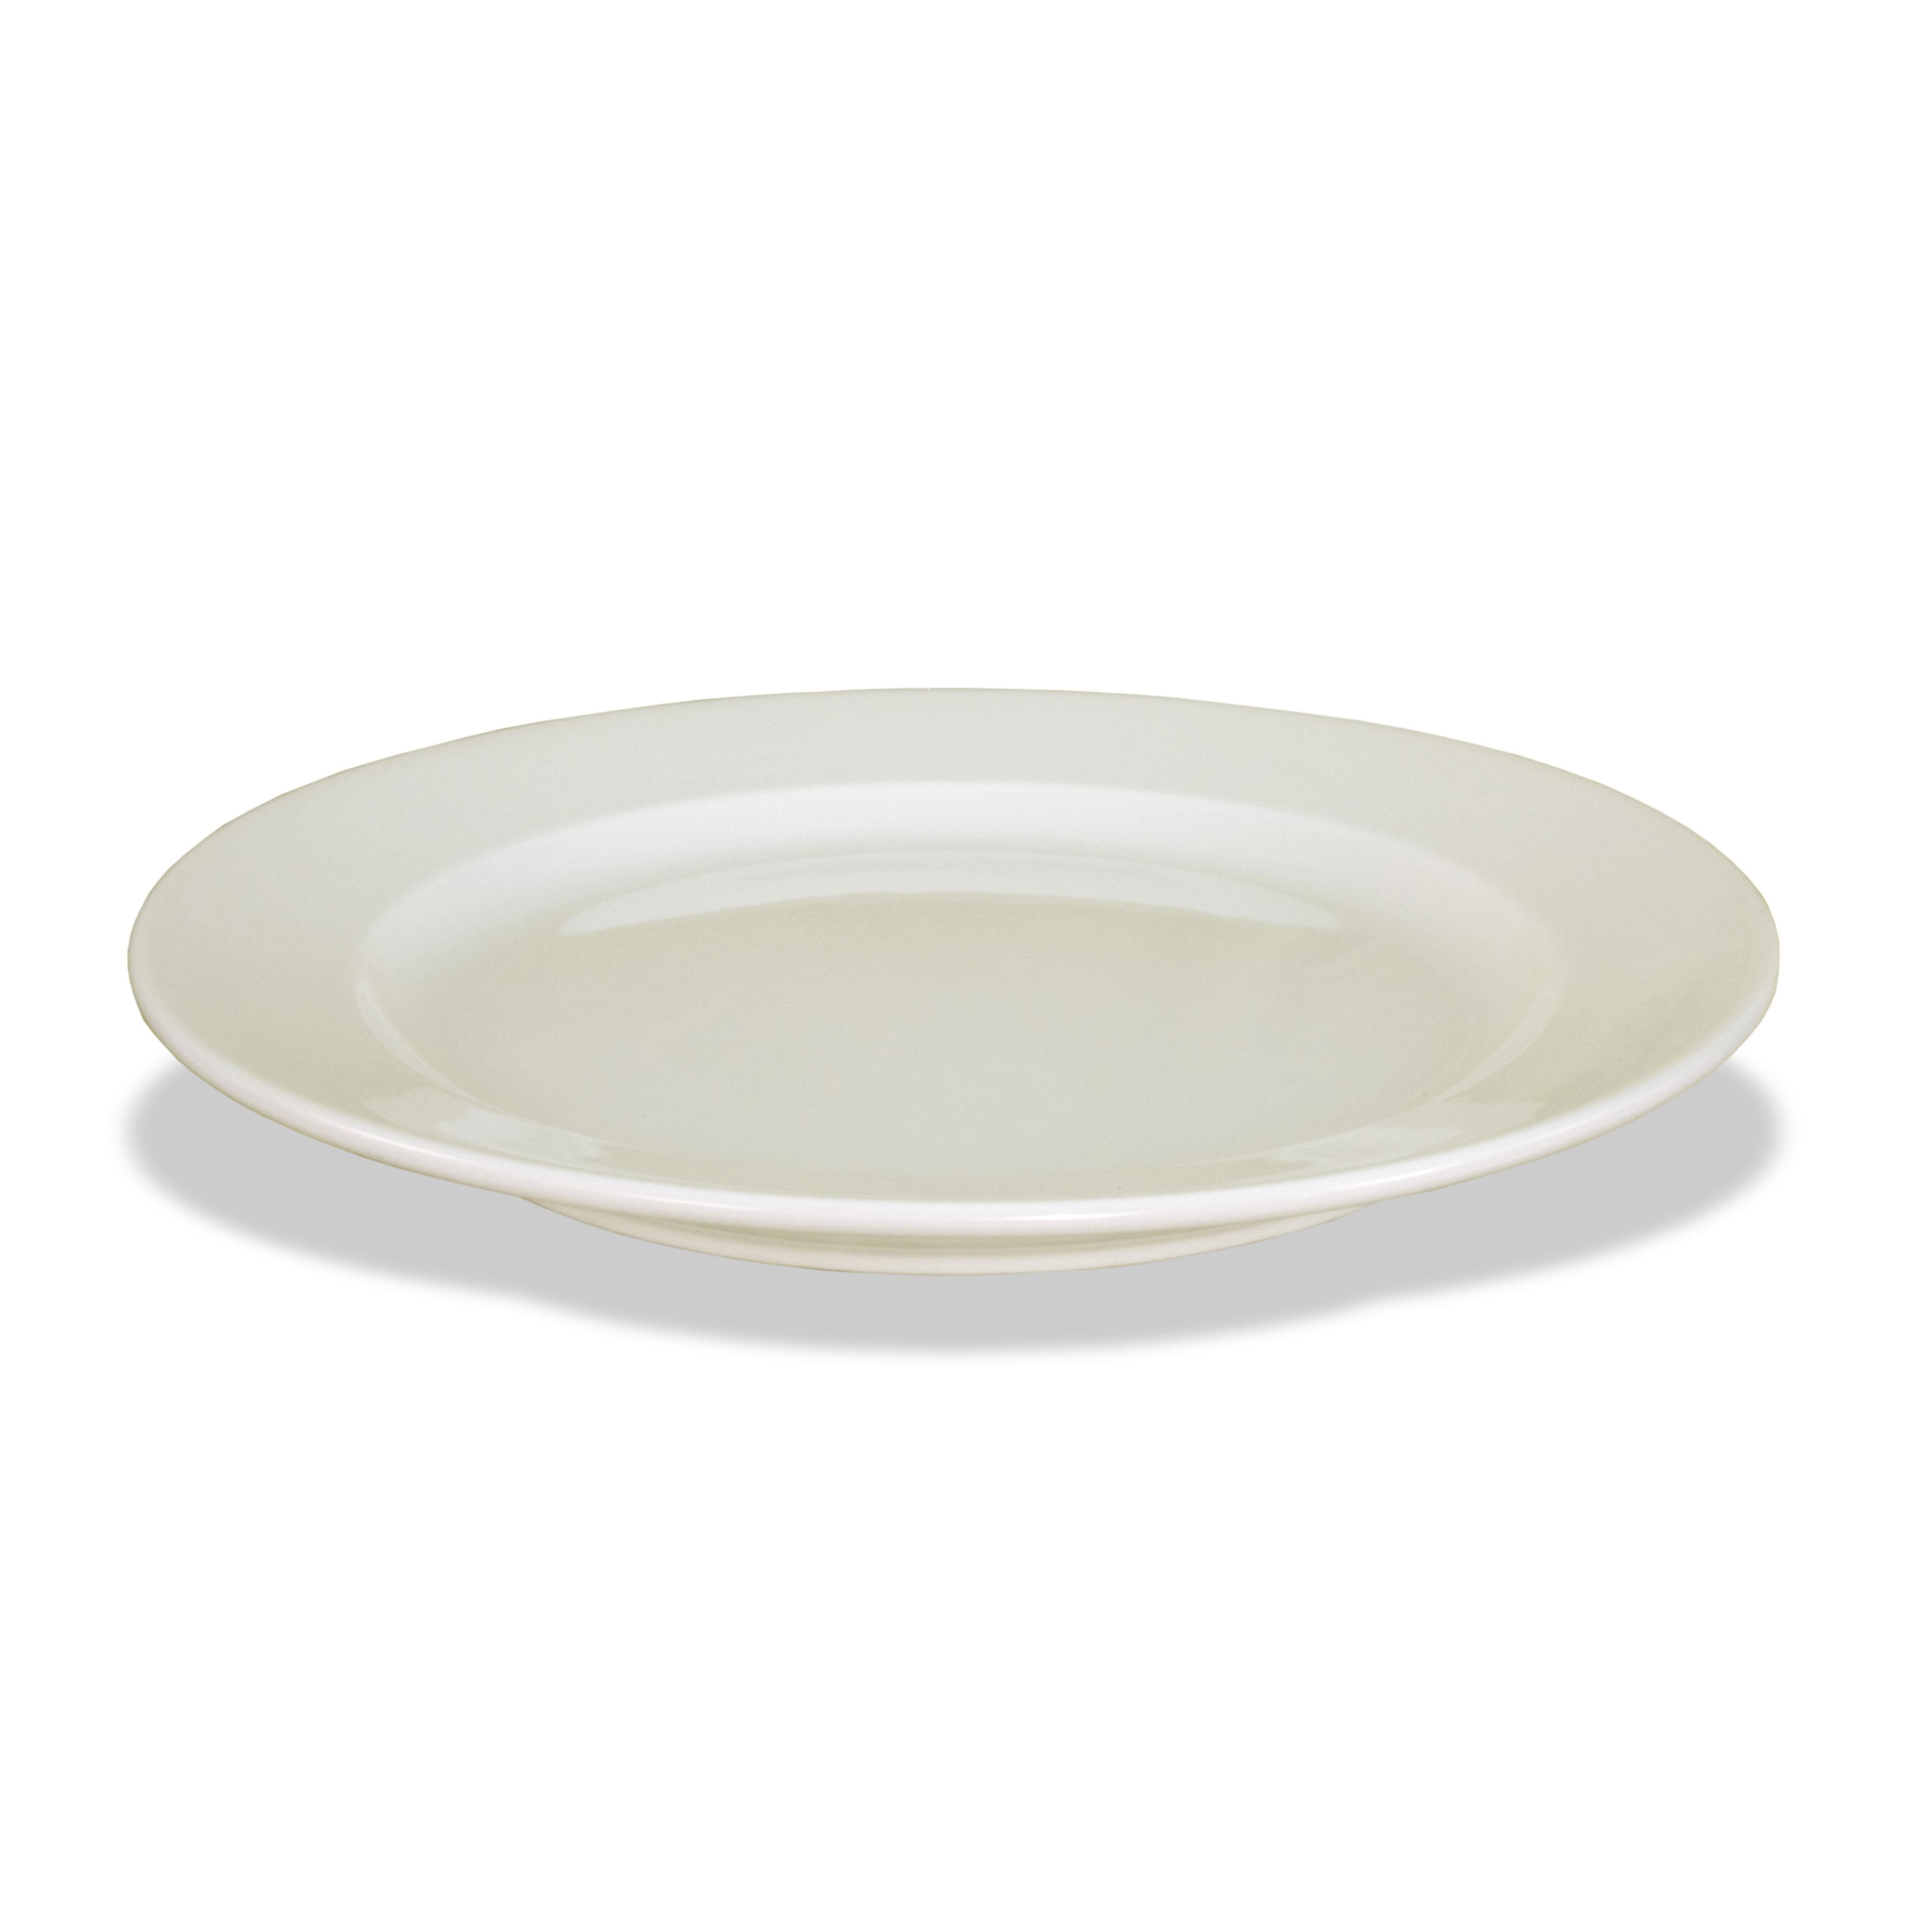 Crestware BEL43 plate, china